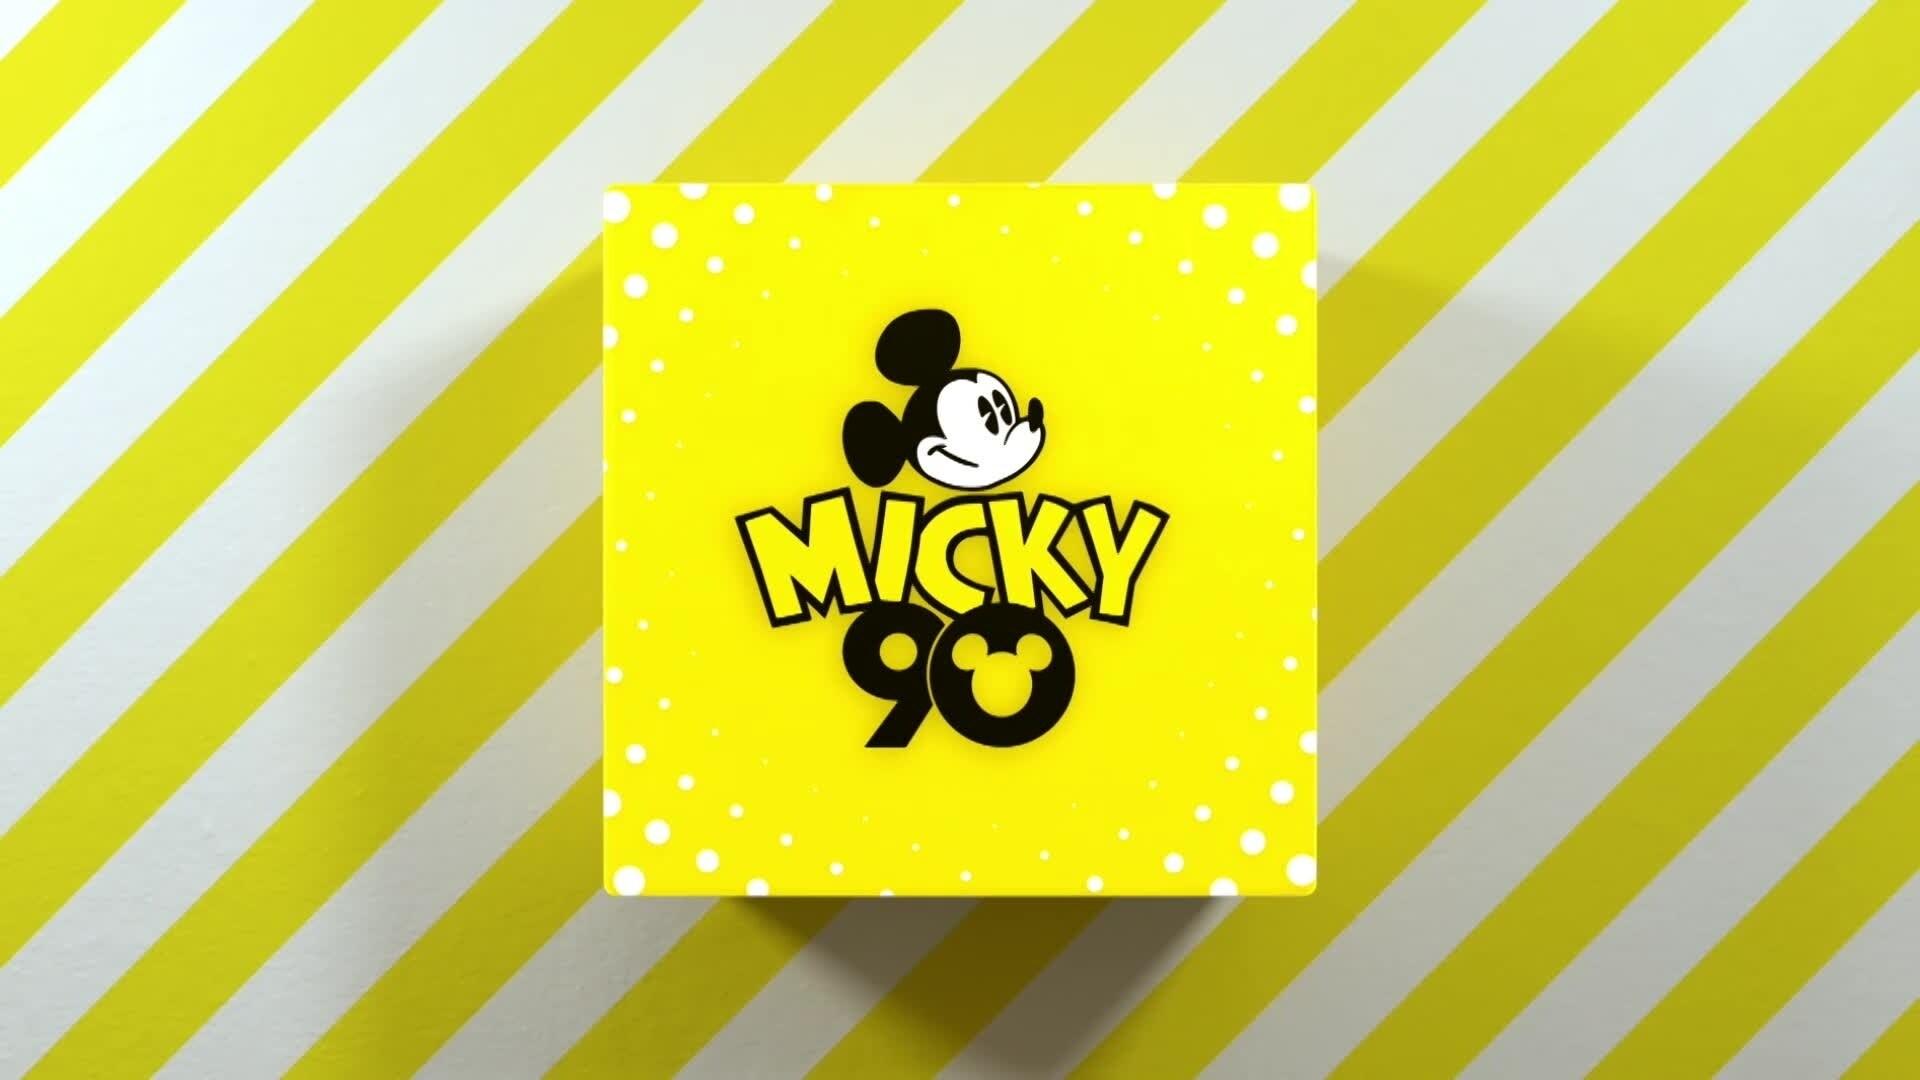 Micky Fotowettbewerb